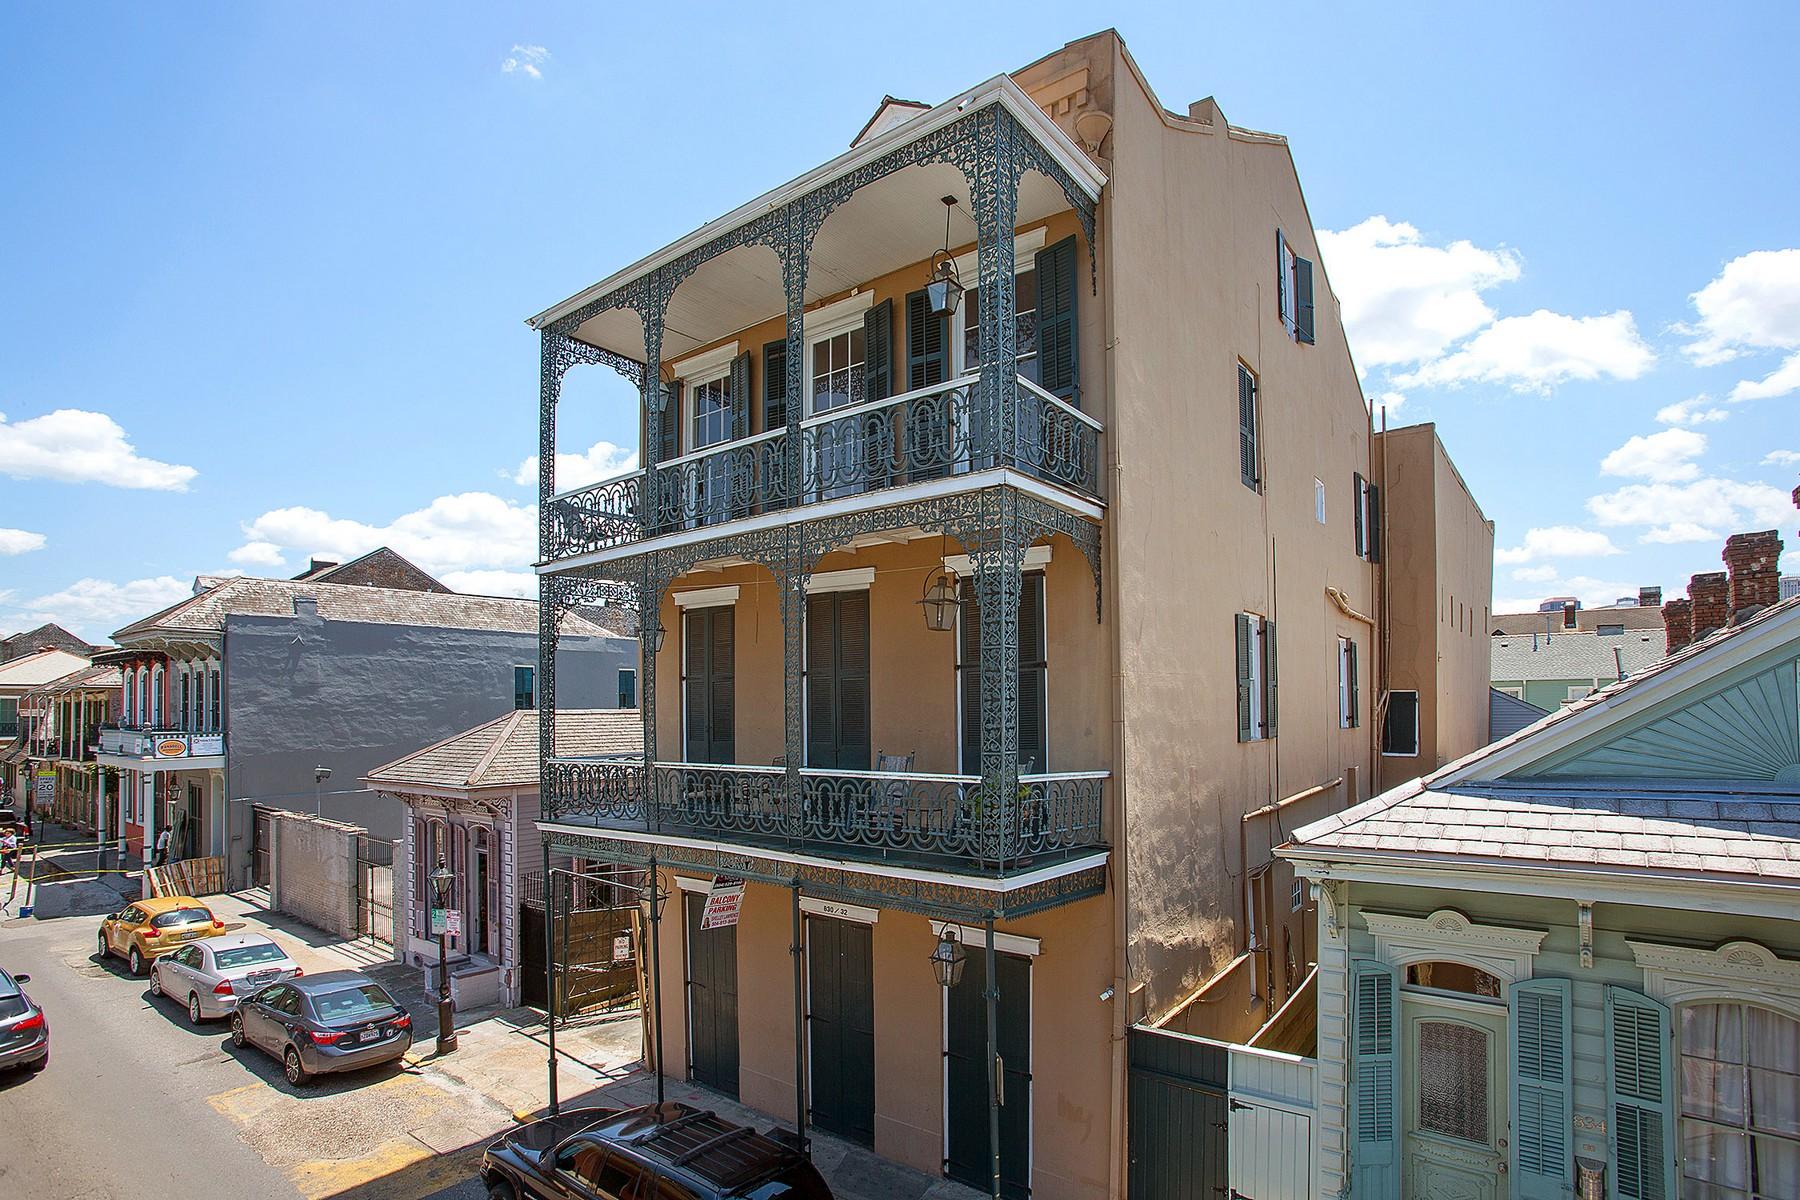 Condomínio para Venda às 830 St. Philip Street, New Orleans 830 St Philip St #I French Quarter, New Orleans, Louisiana, 70116 Estados Unidos